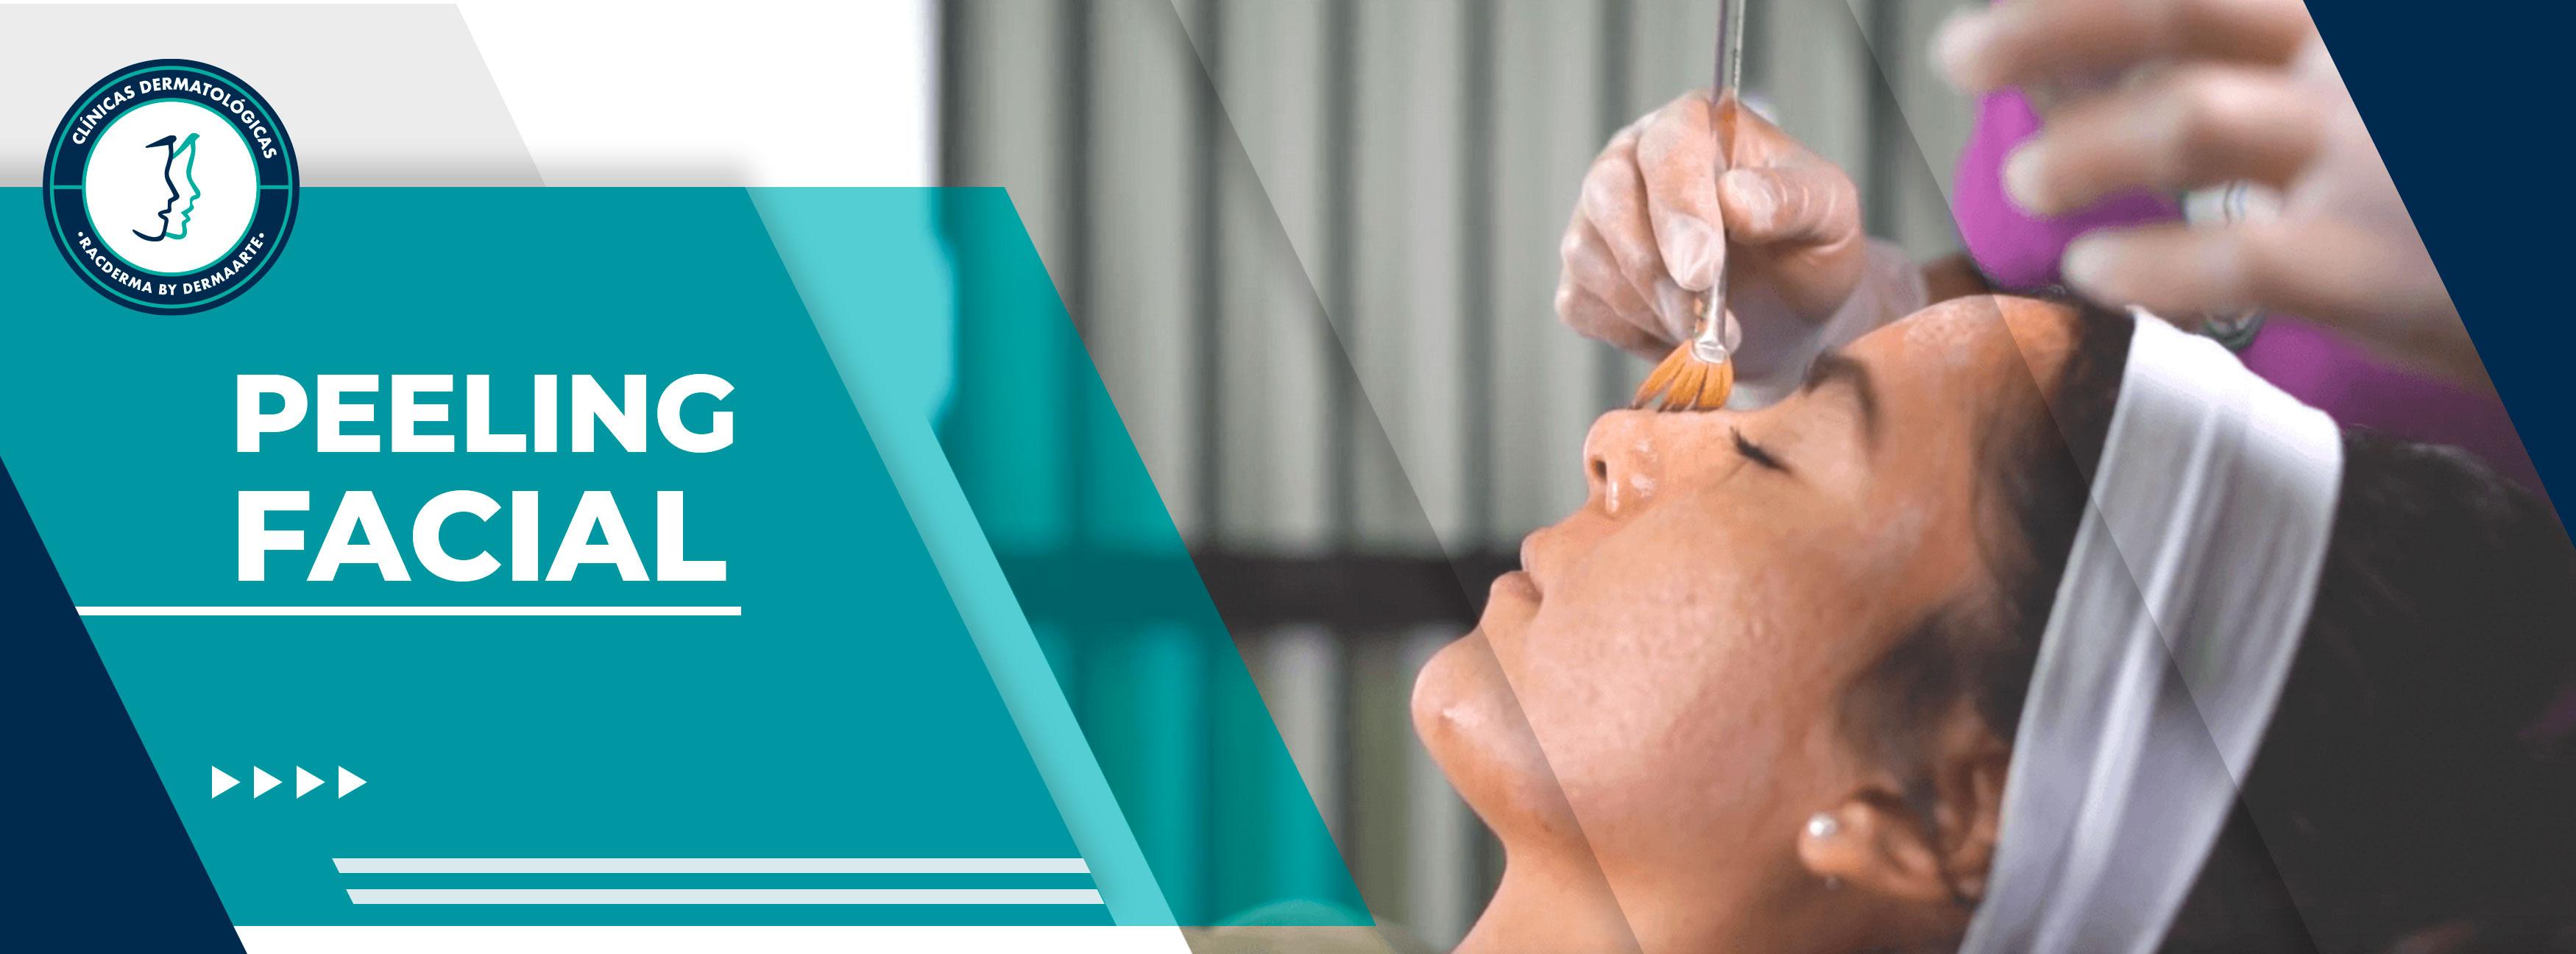 Peeling medico, peeling facial